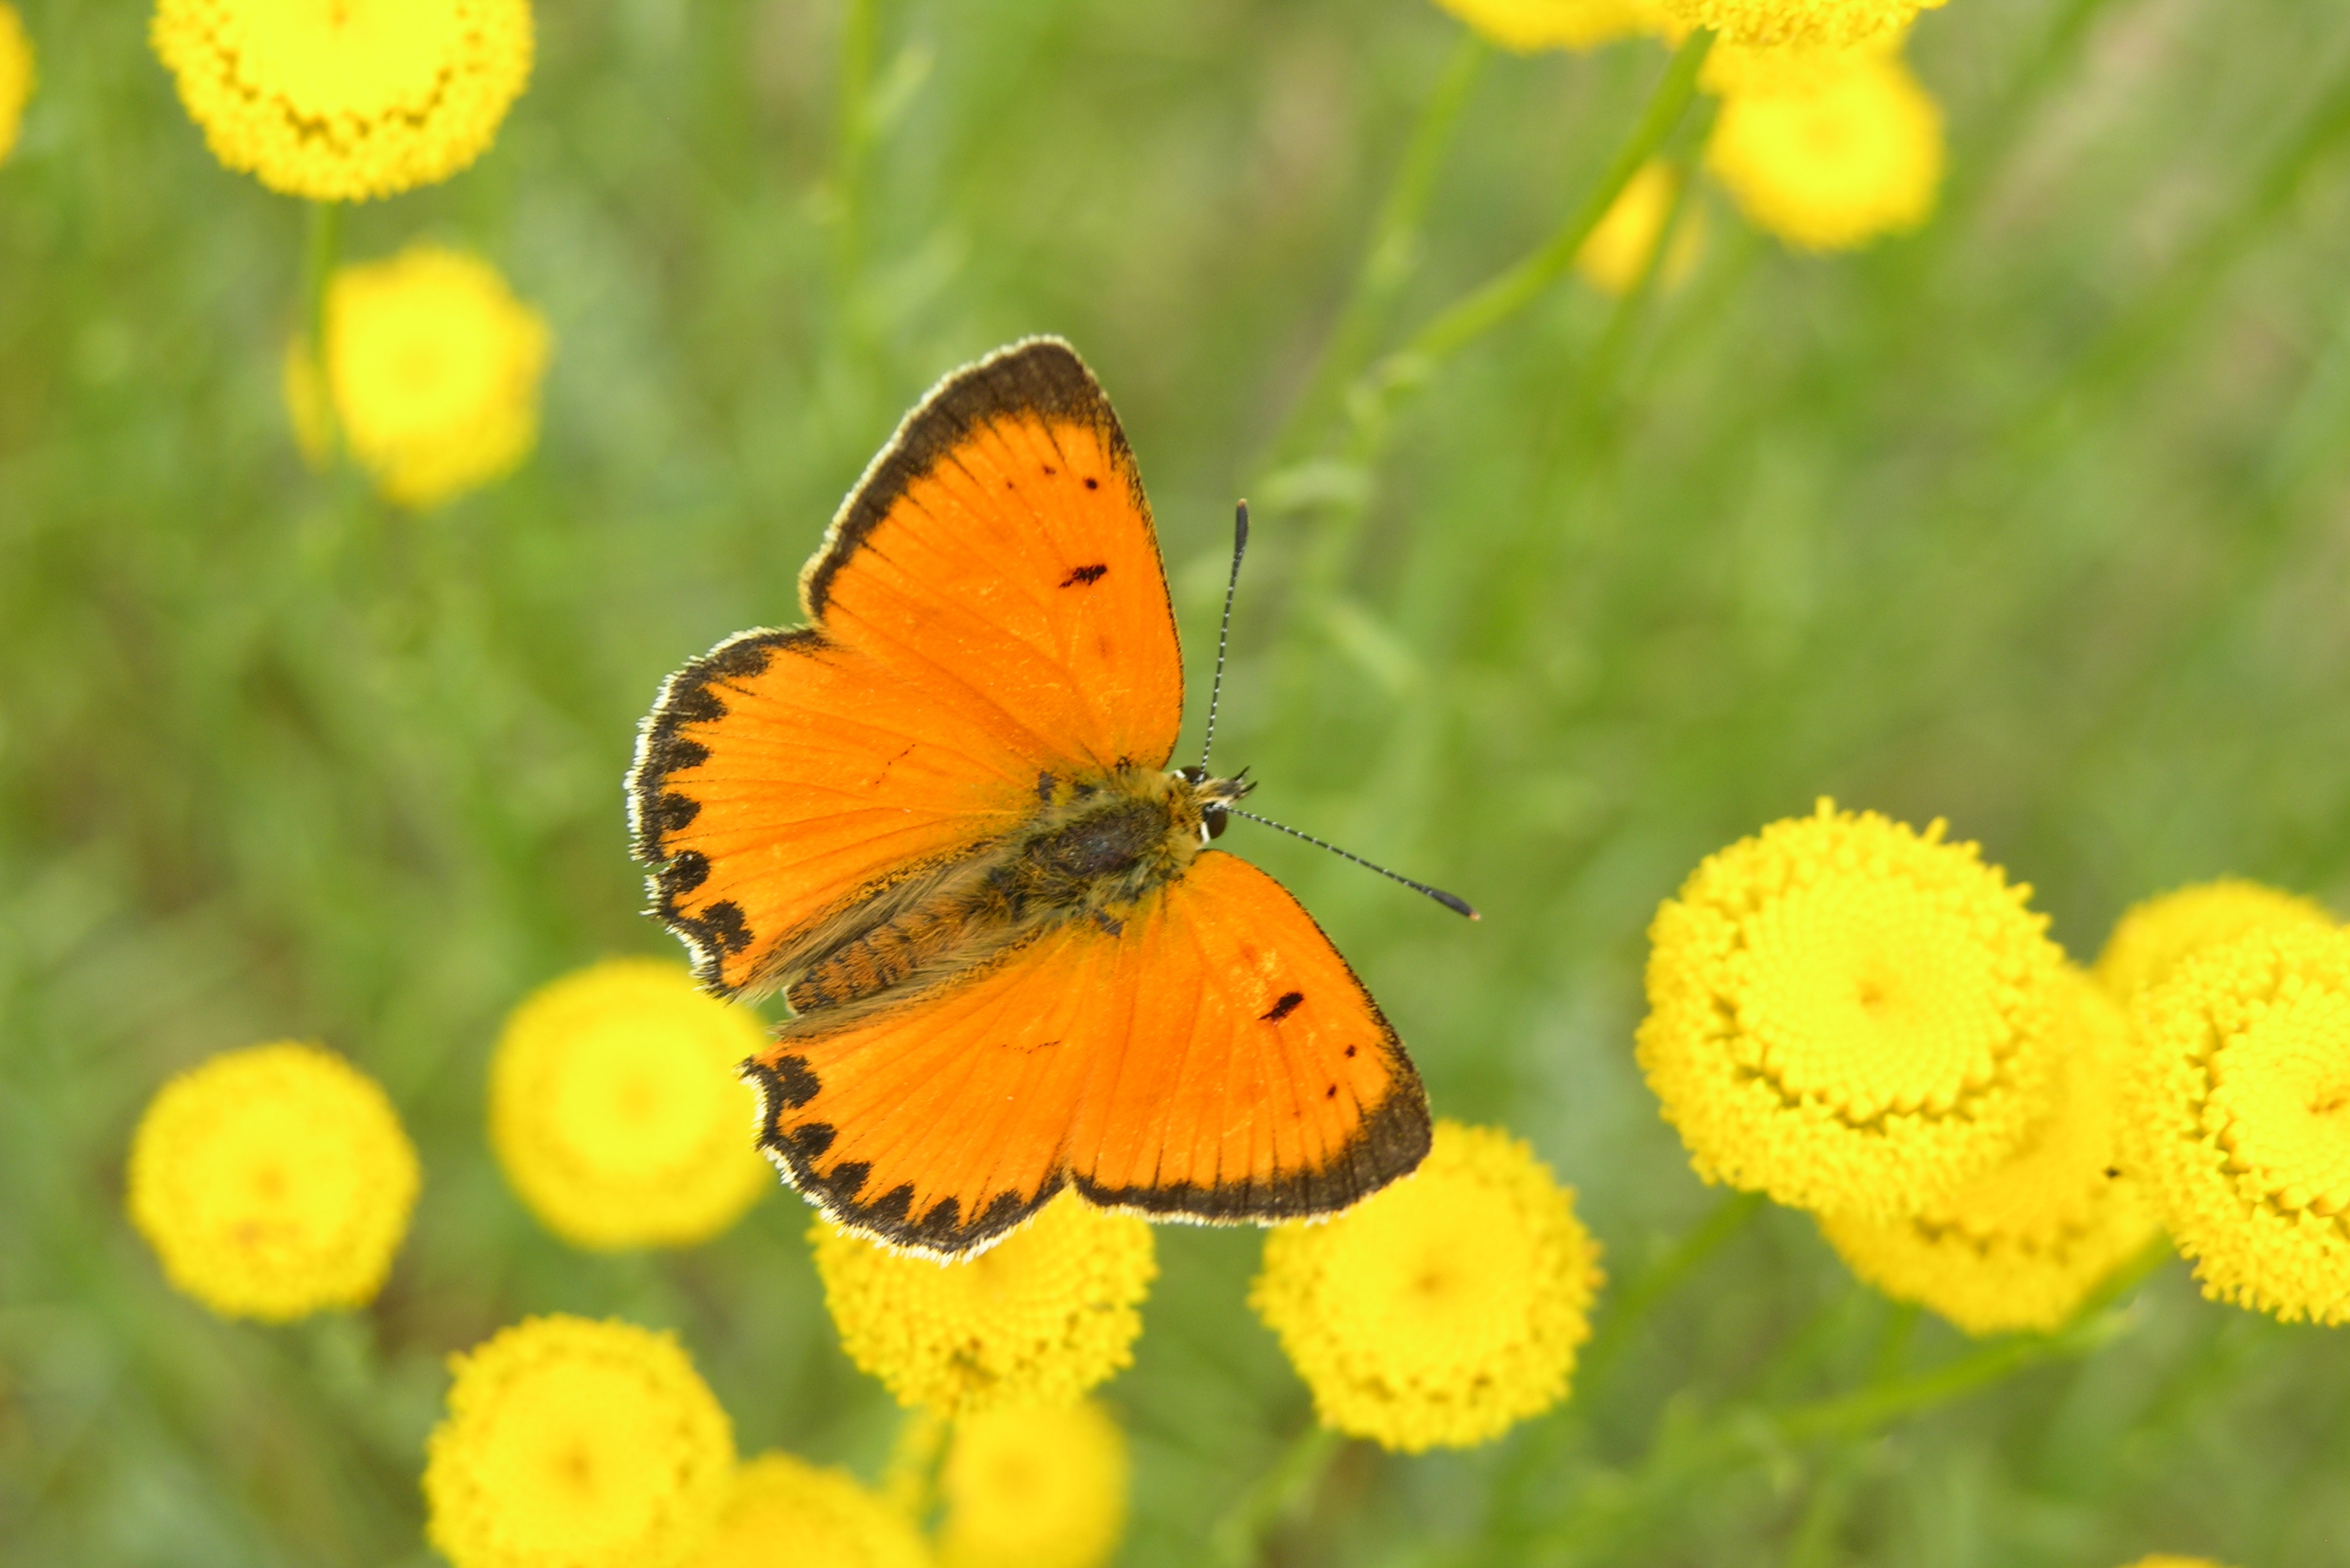 Las mariposas de la Sierra de Guadarrama se desplazan a zonas de alta montaña